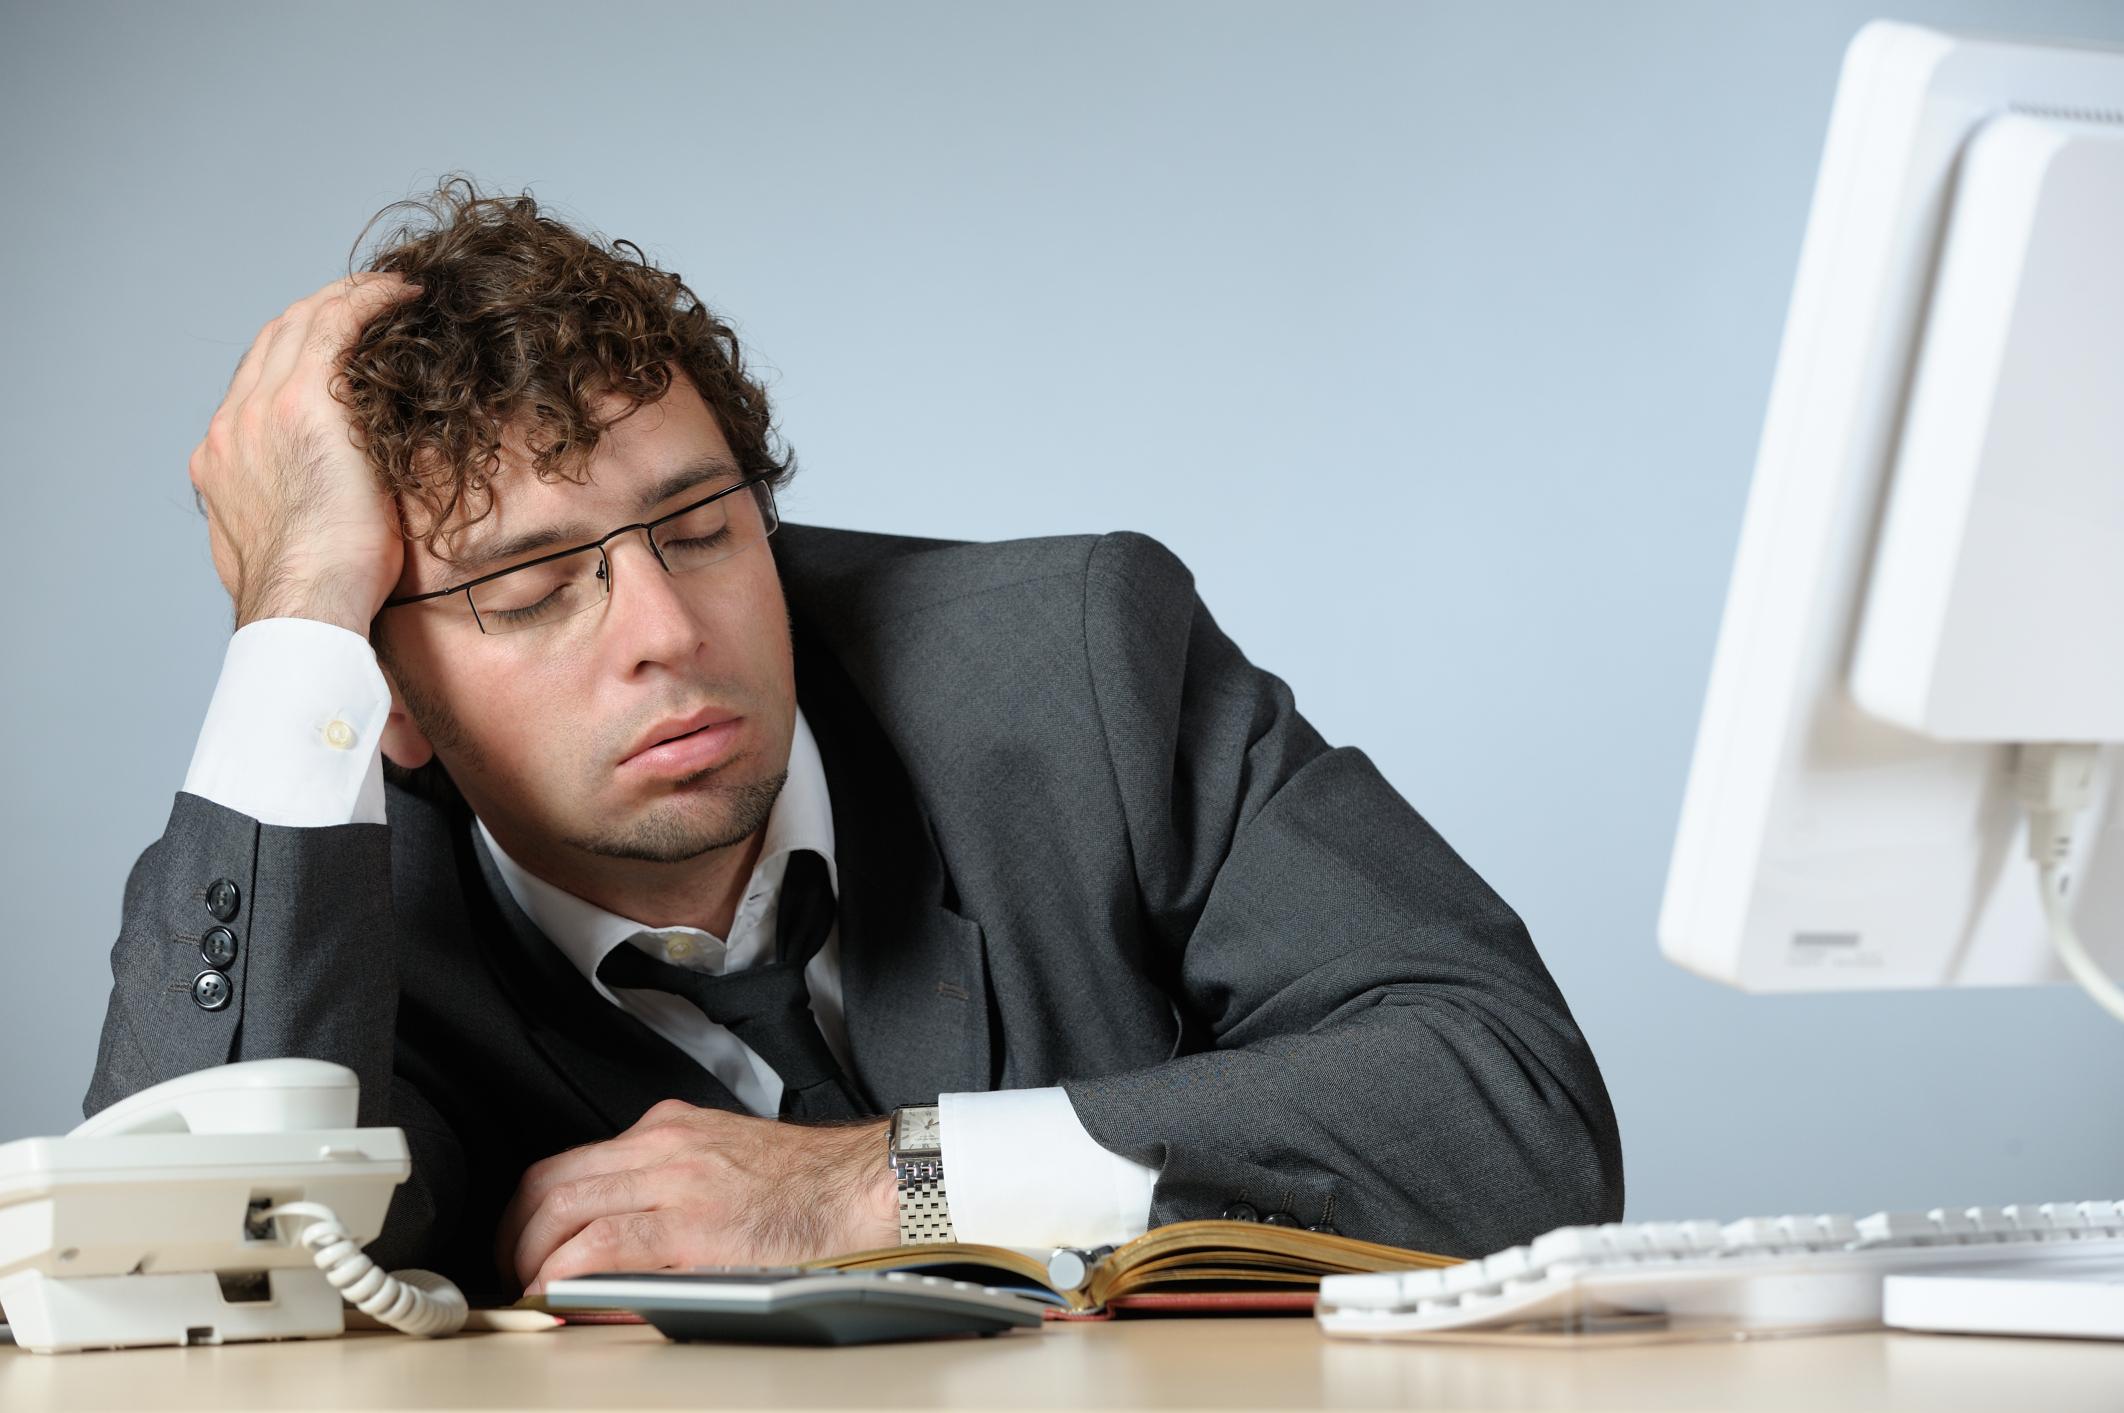 15 Tampang Lucu Karyawan Yang Ketiduran Di Kantor Duh Kasihan